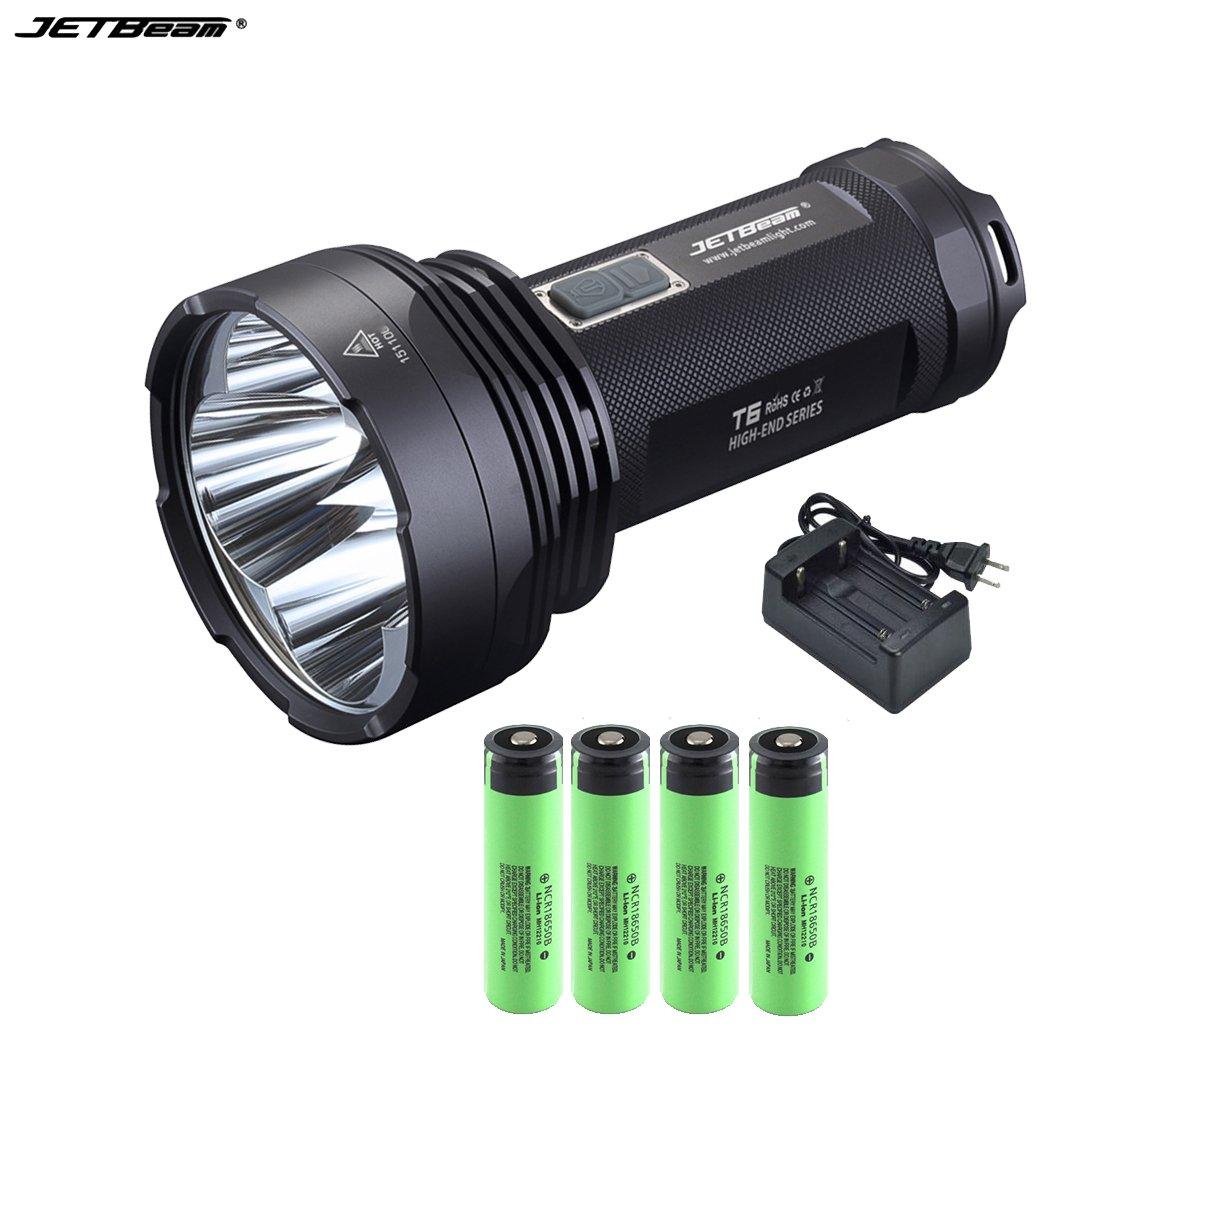 JETBeam T6 Cree XP-L LED 4350 lumens 18650 Flashlight With 3.7v 3400mAh Battery +battery